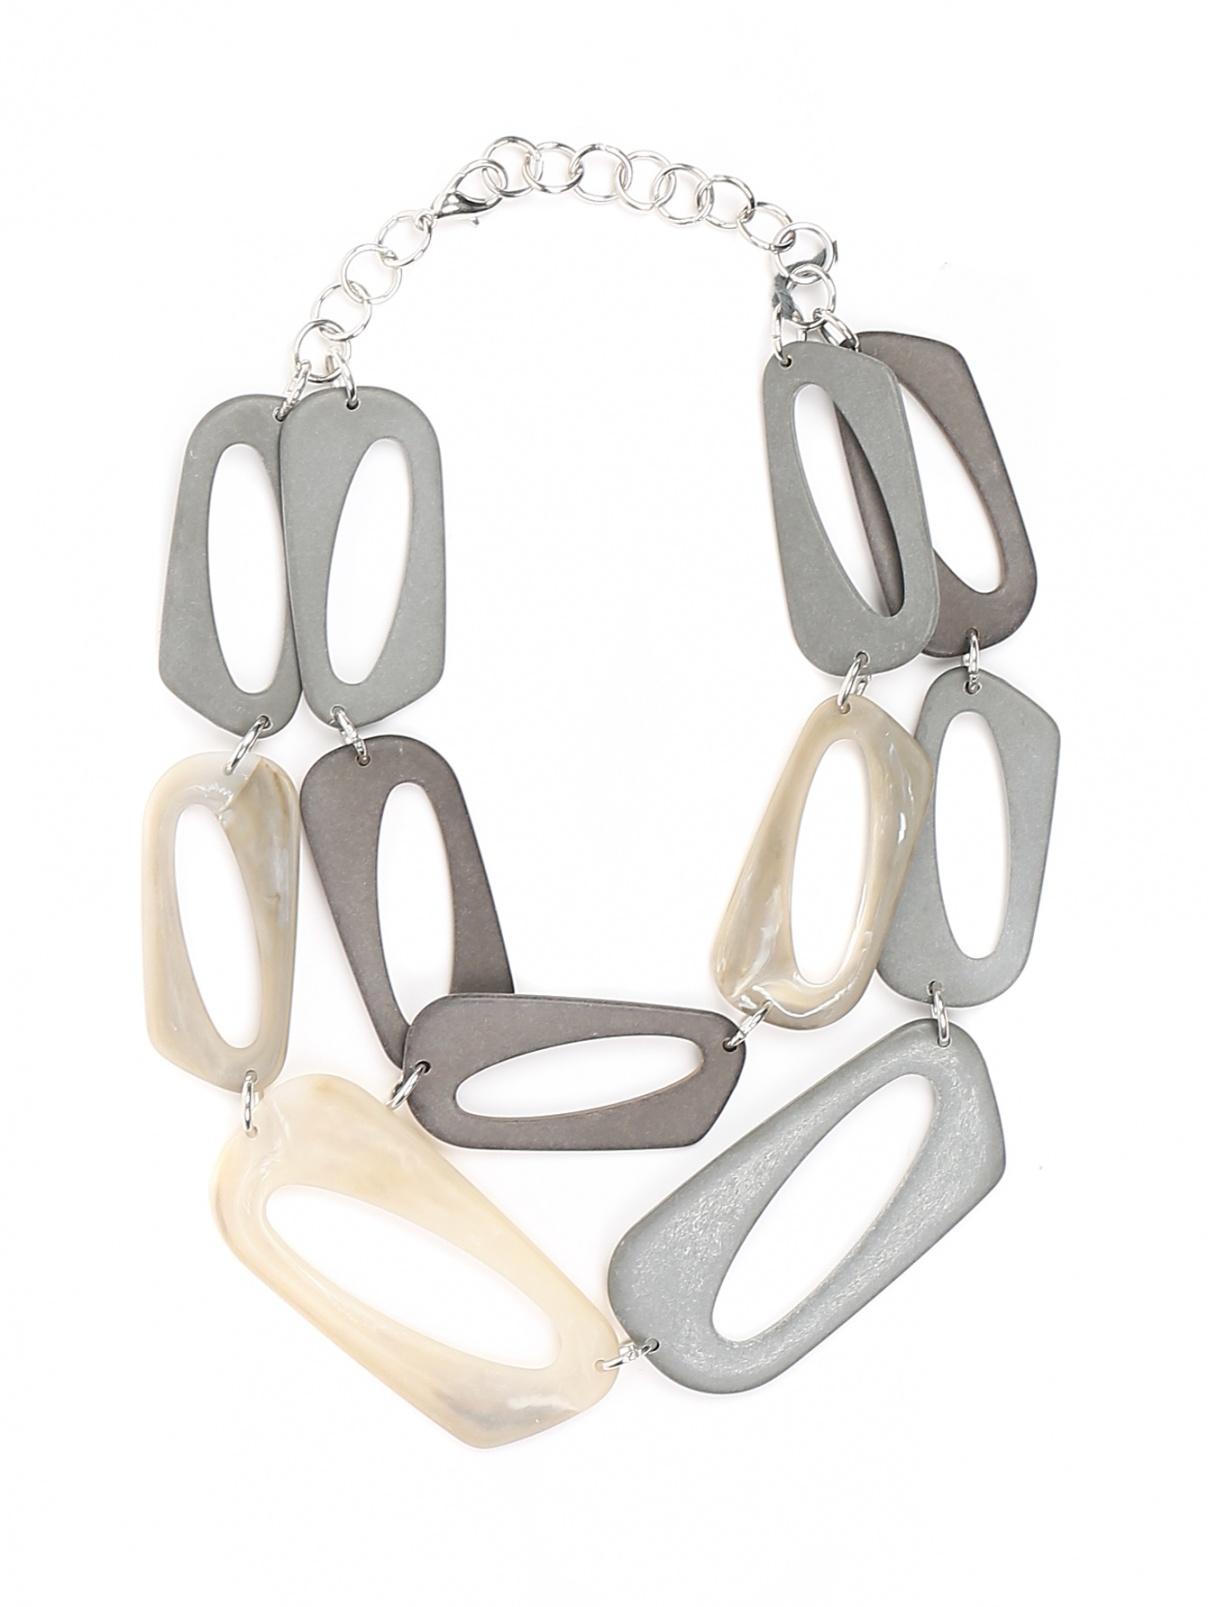 Ожерелье из пластика геометрической формы Persona by Marina Rinaldi  –  Общий вид  – Цвет:  Серый